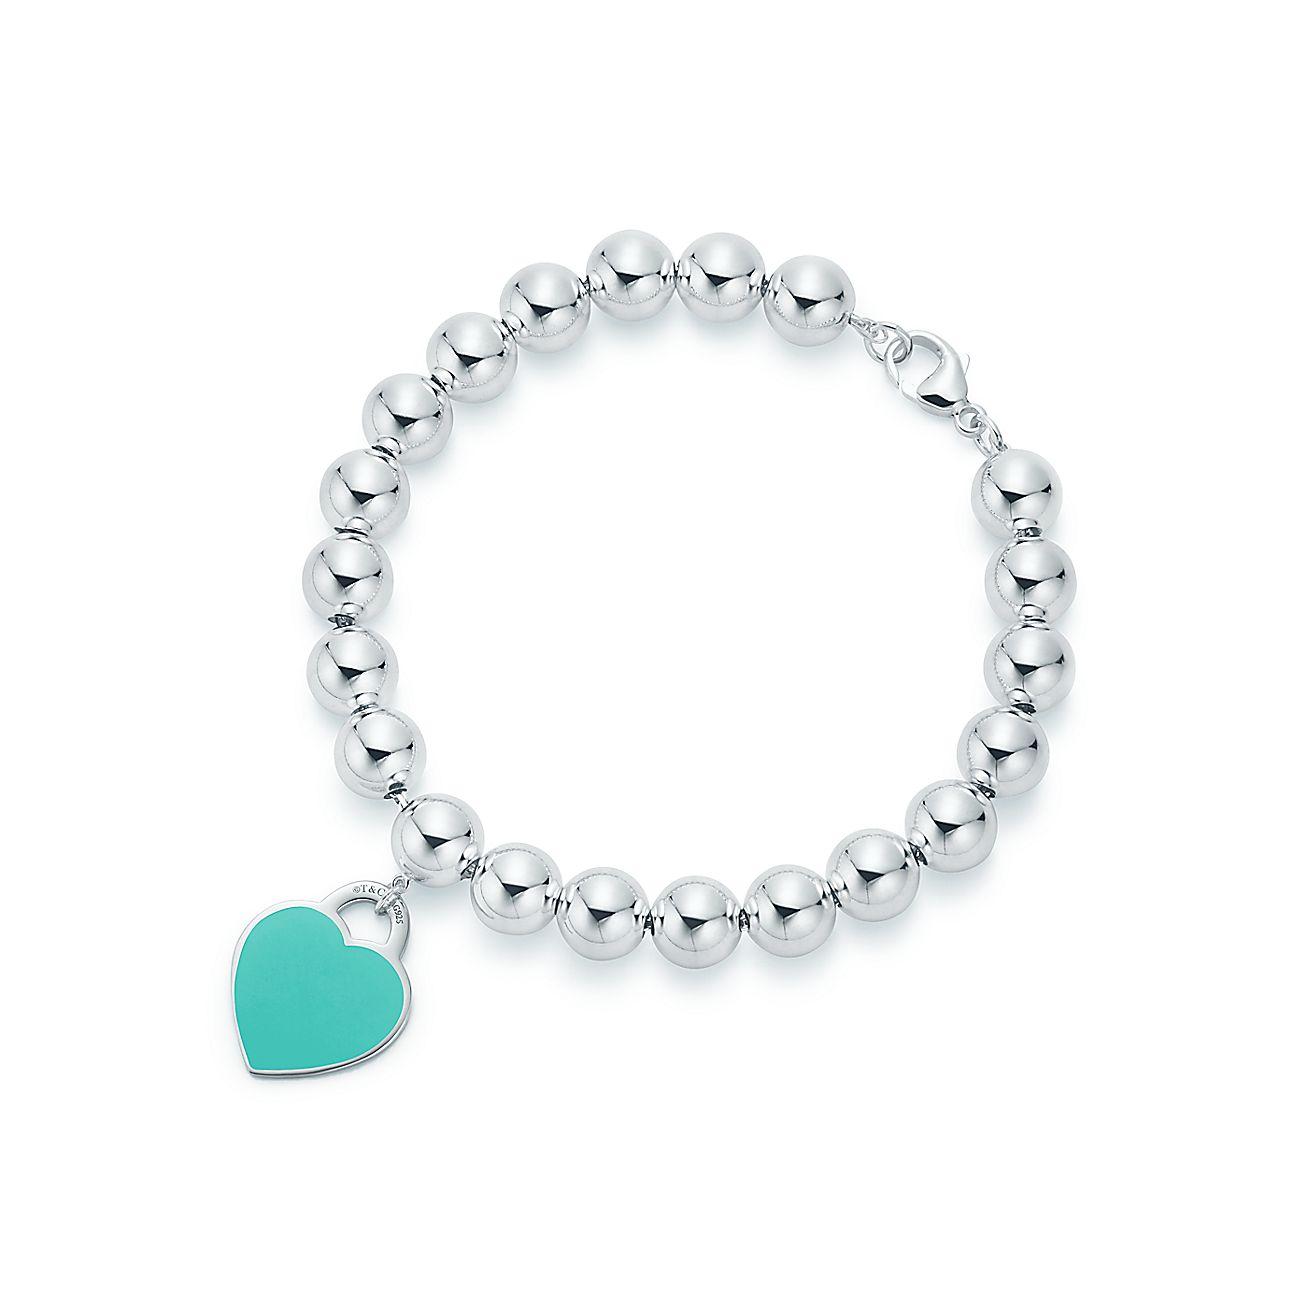 Tiffany Rings With Hearts